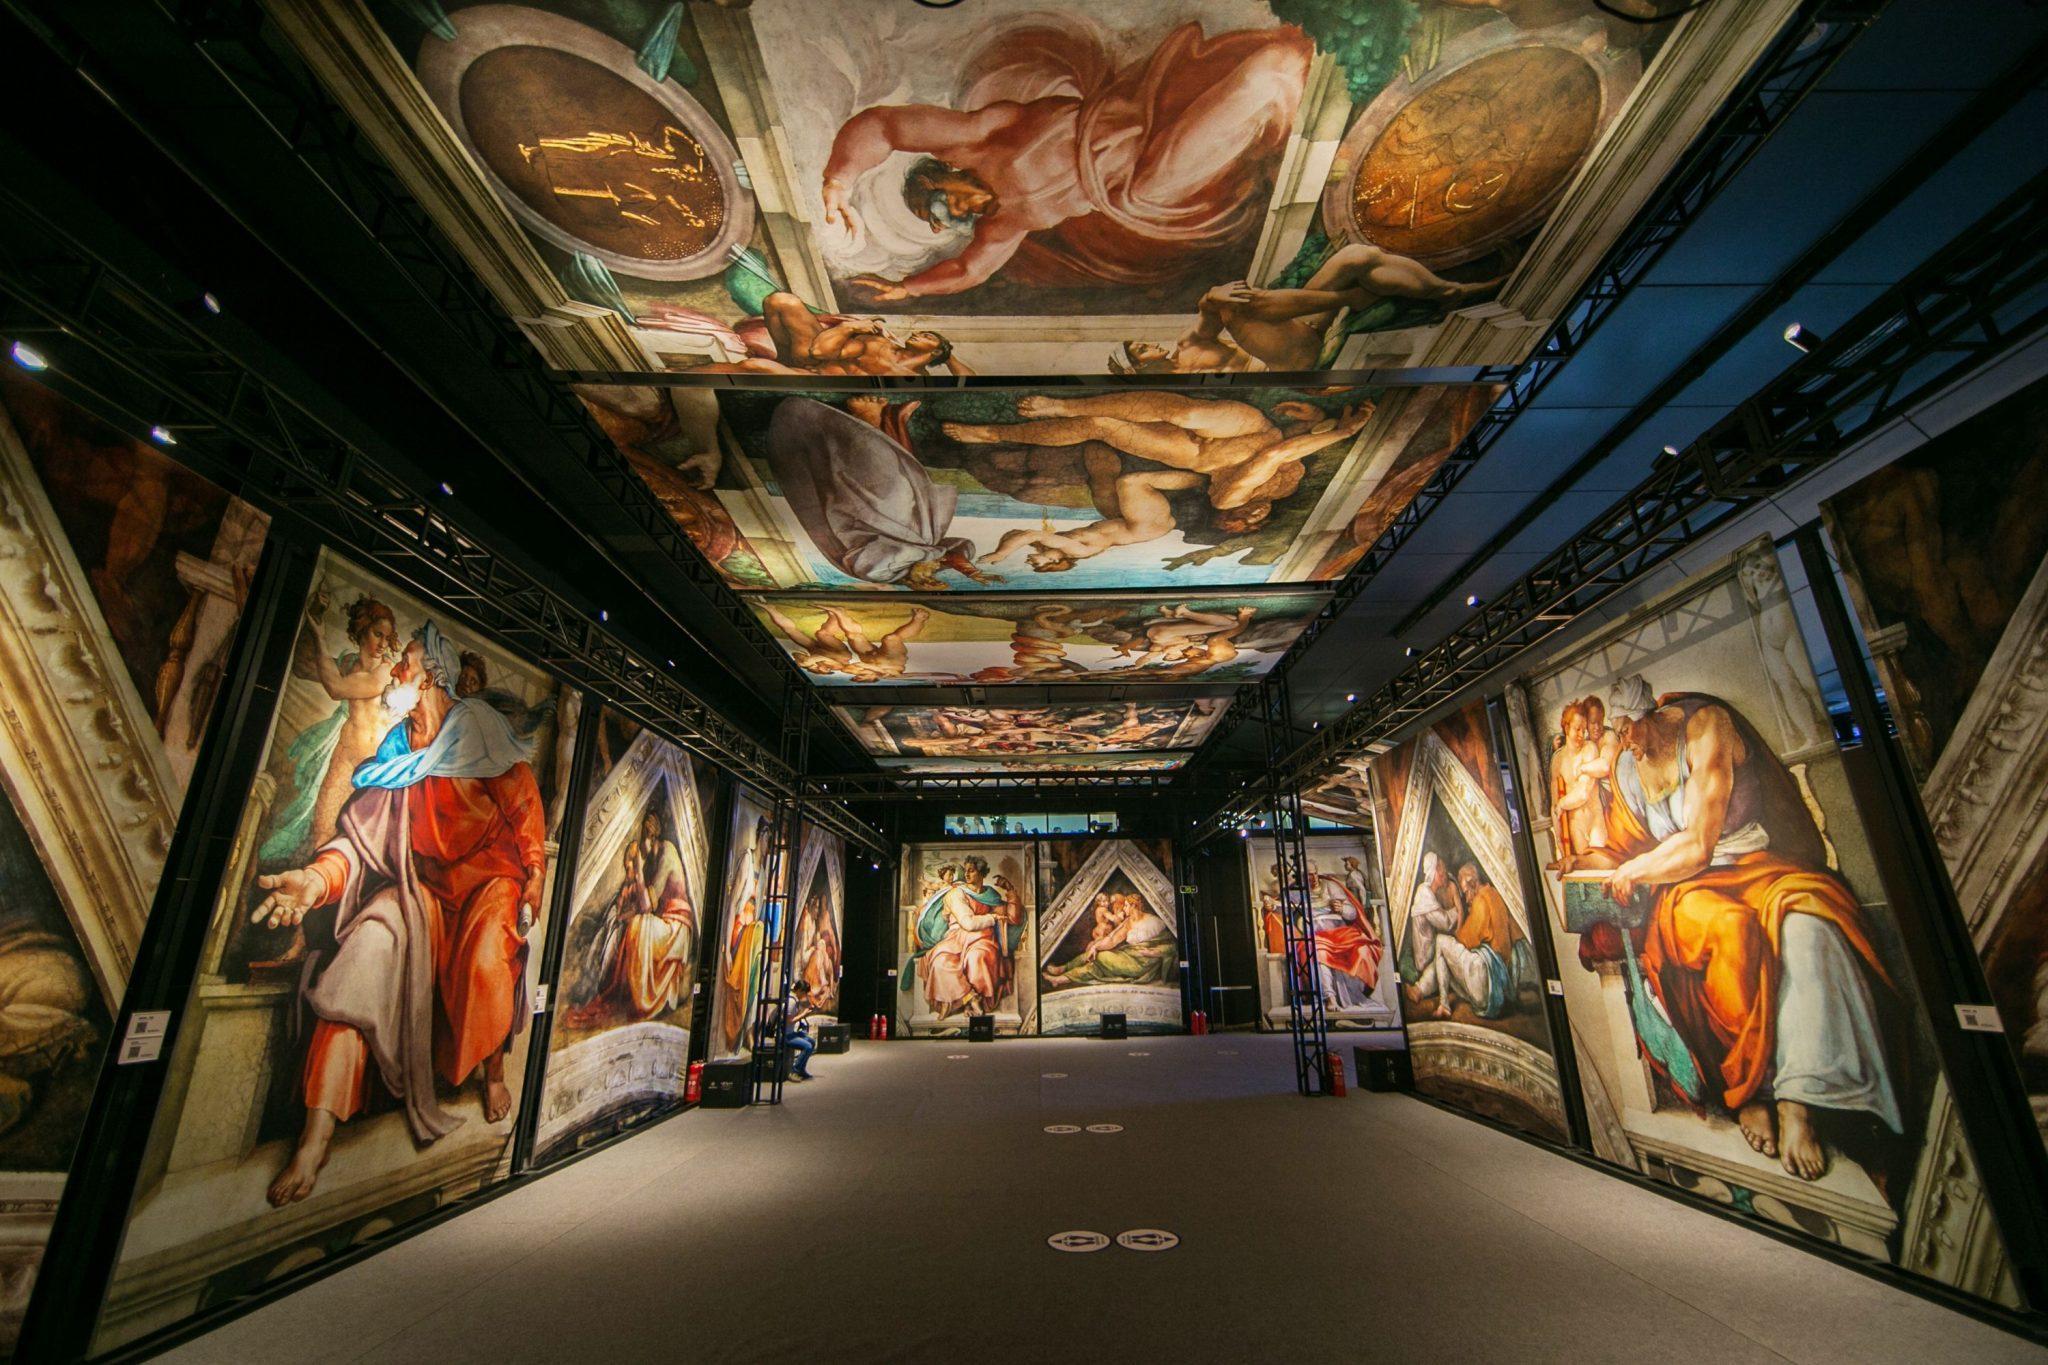 Sistine Charlotte exhibit TICKETS NOW LIVE After Secret Location Unleashed!